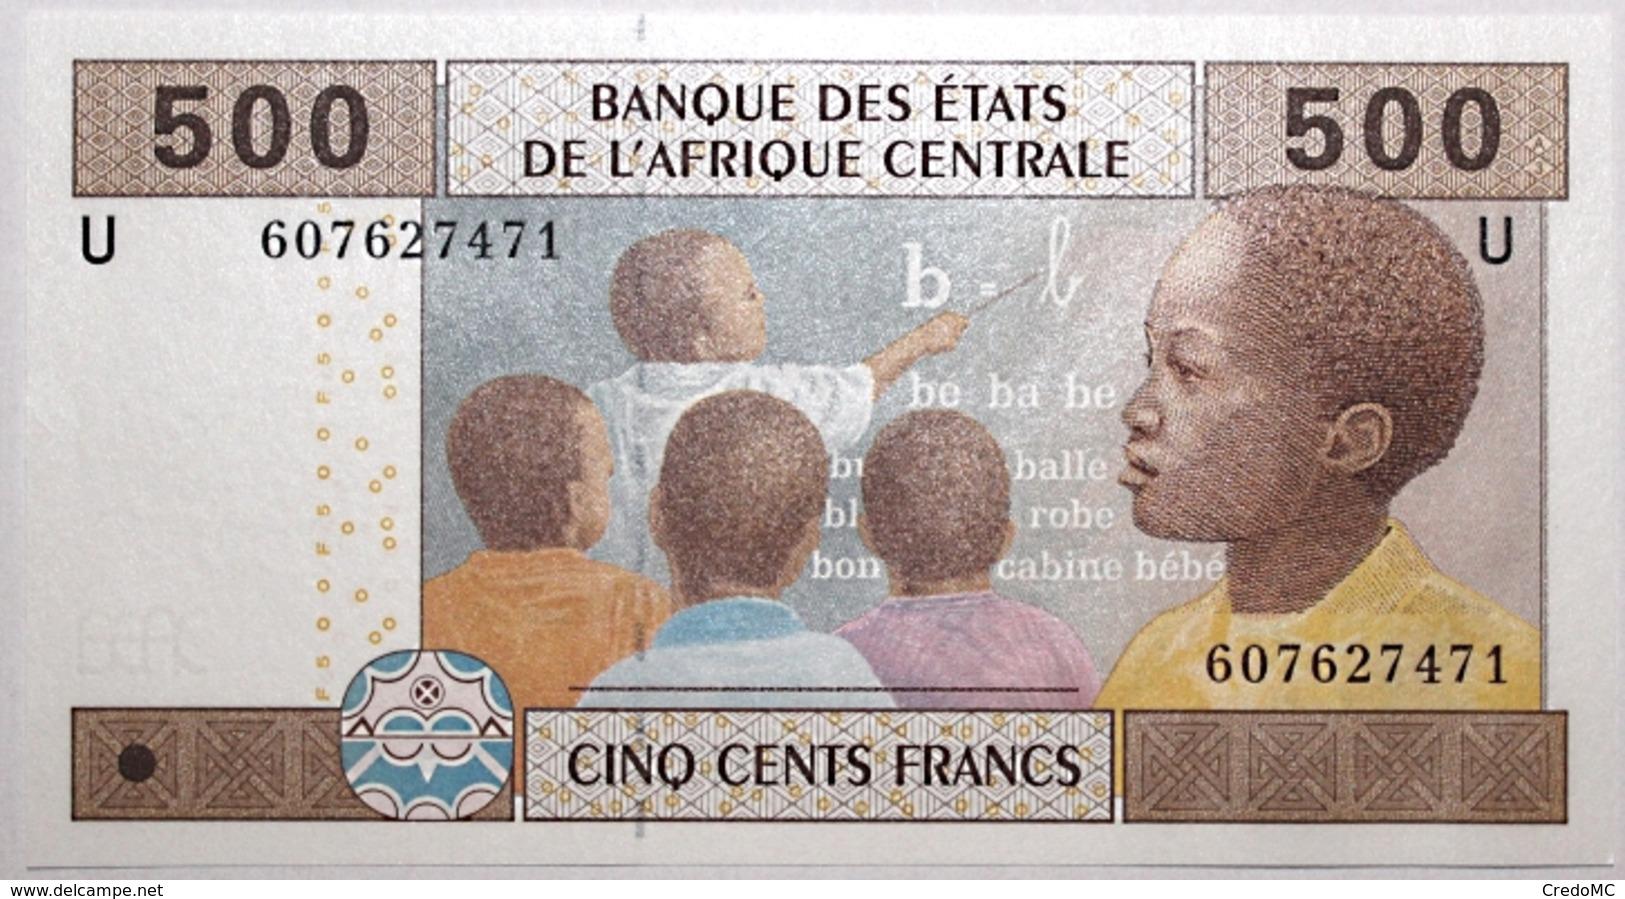 Cameroun - 500 Francs - 2002 - PICK 206Ua.4 - NEUF - West African States